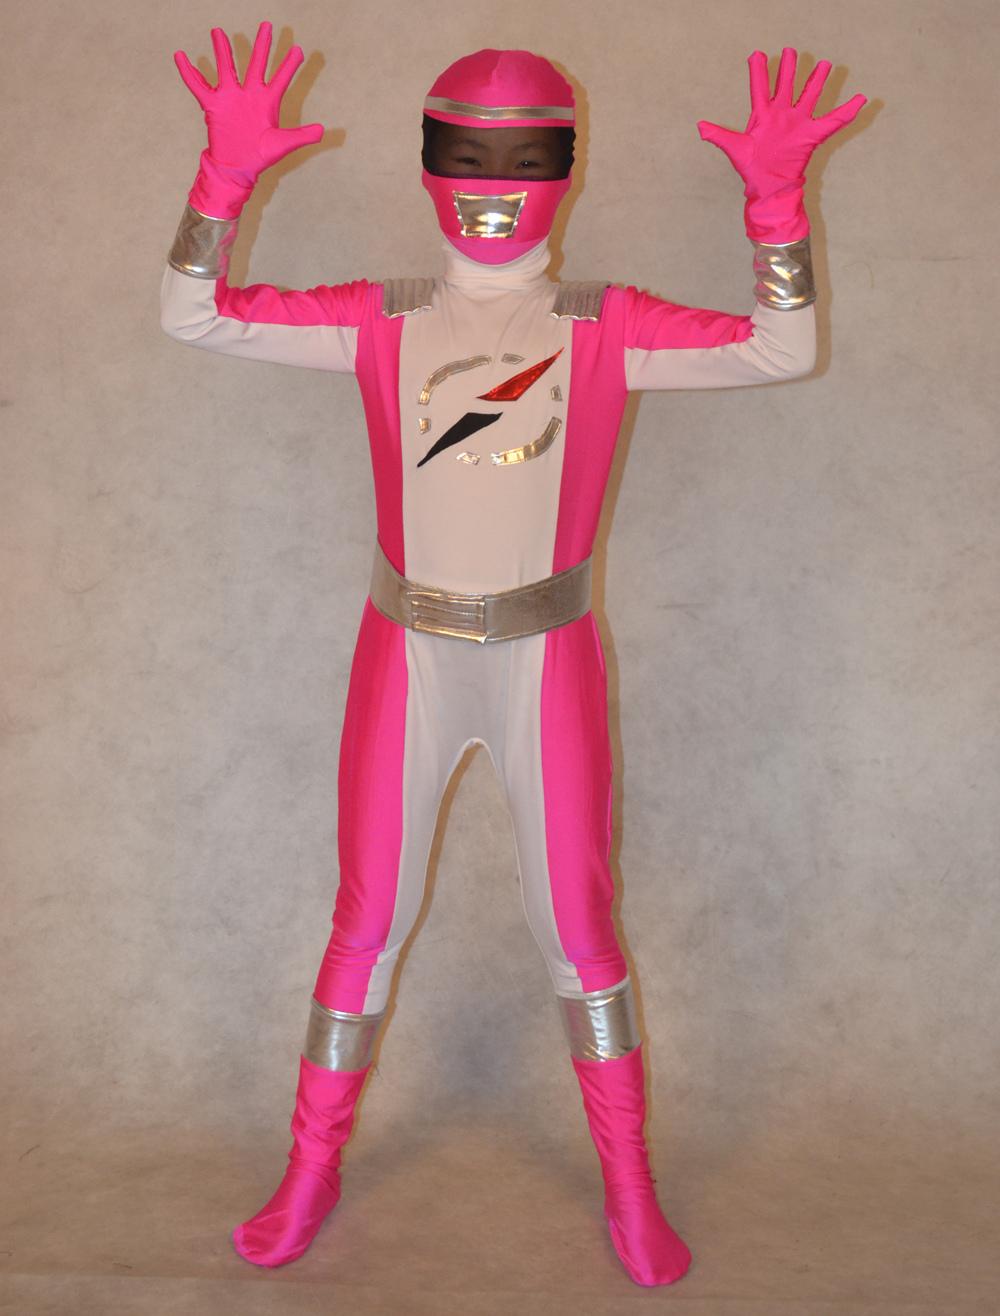 ... Pink Power Ranger Zentai Suit for Kid Halloween Super Hero Unisex Full  Bodysuit Halloween-No. 1. 50%OFF. Color Rose fa6365a95